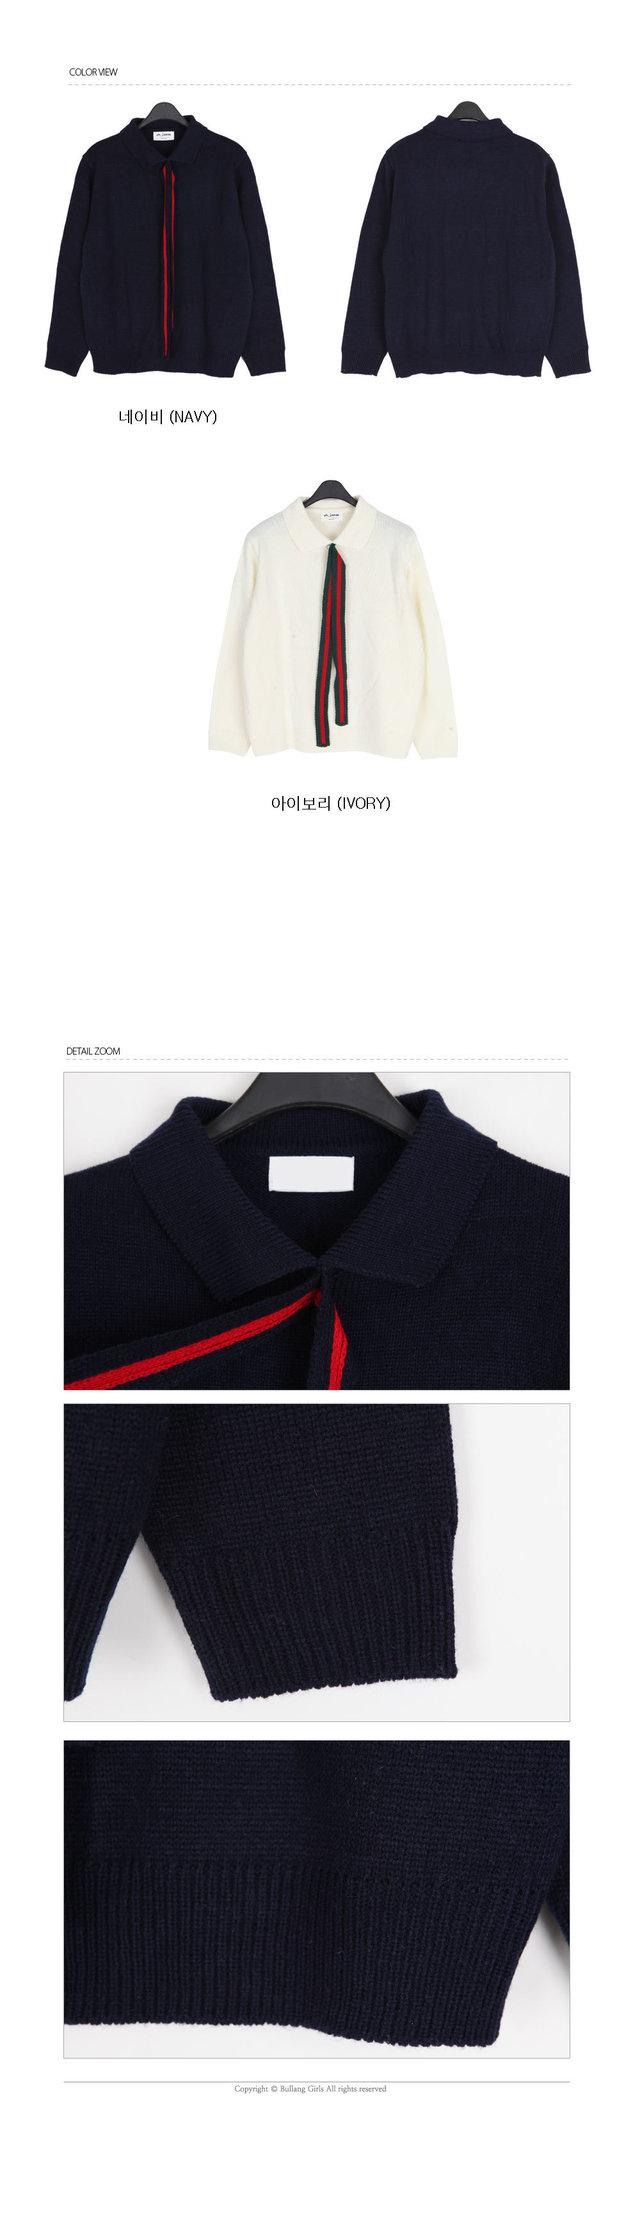 Merichikara knit